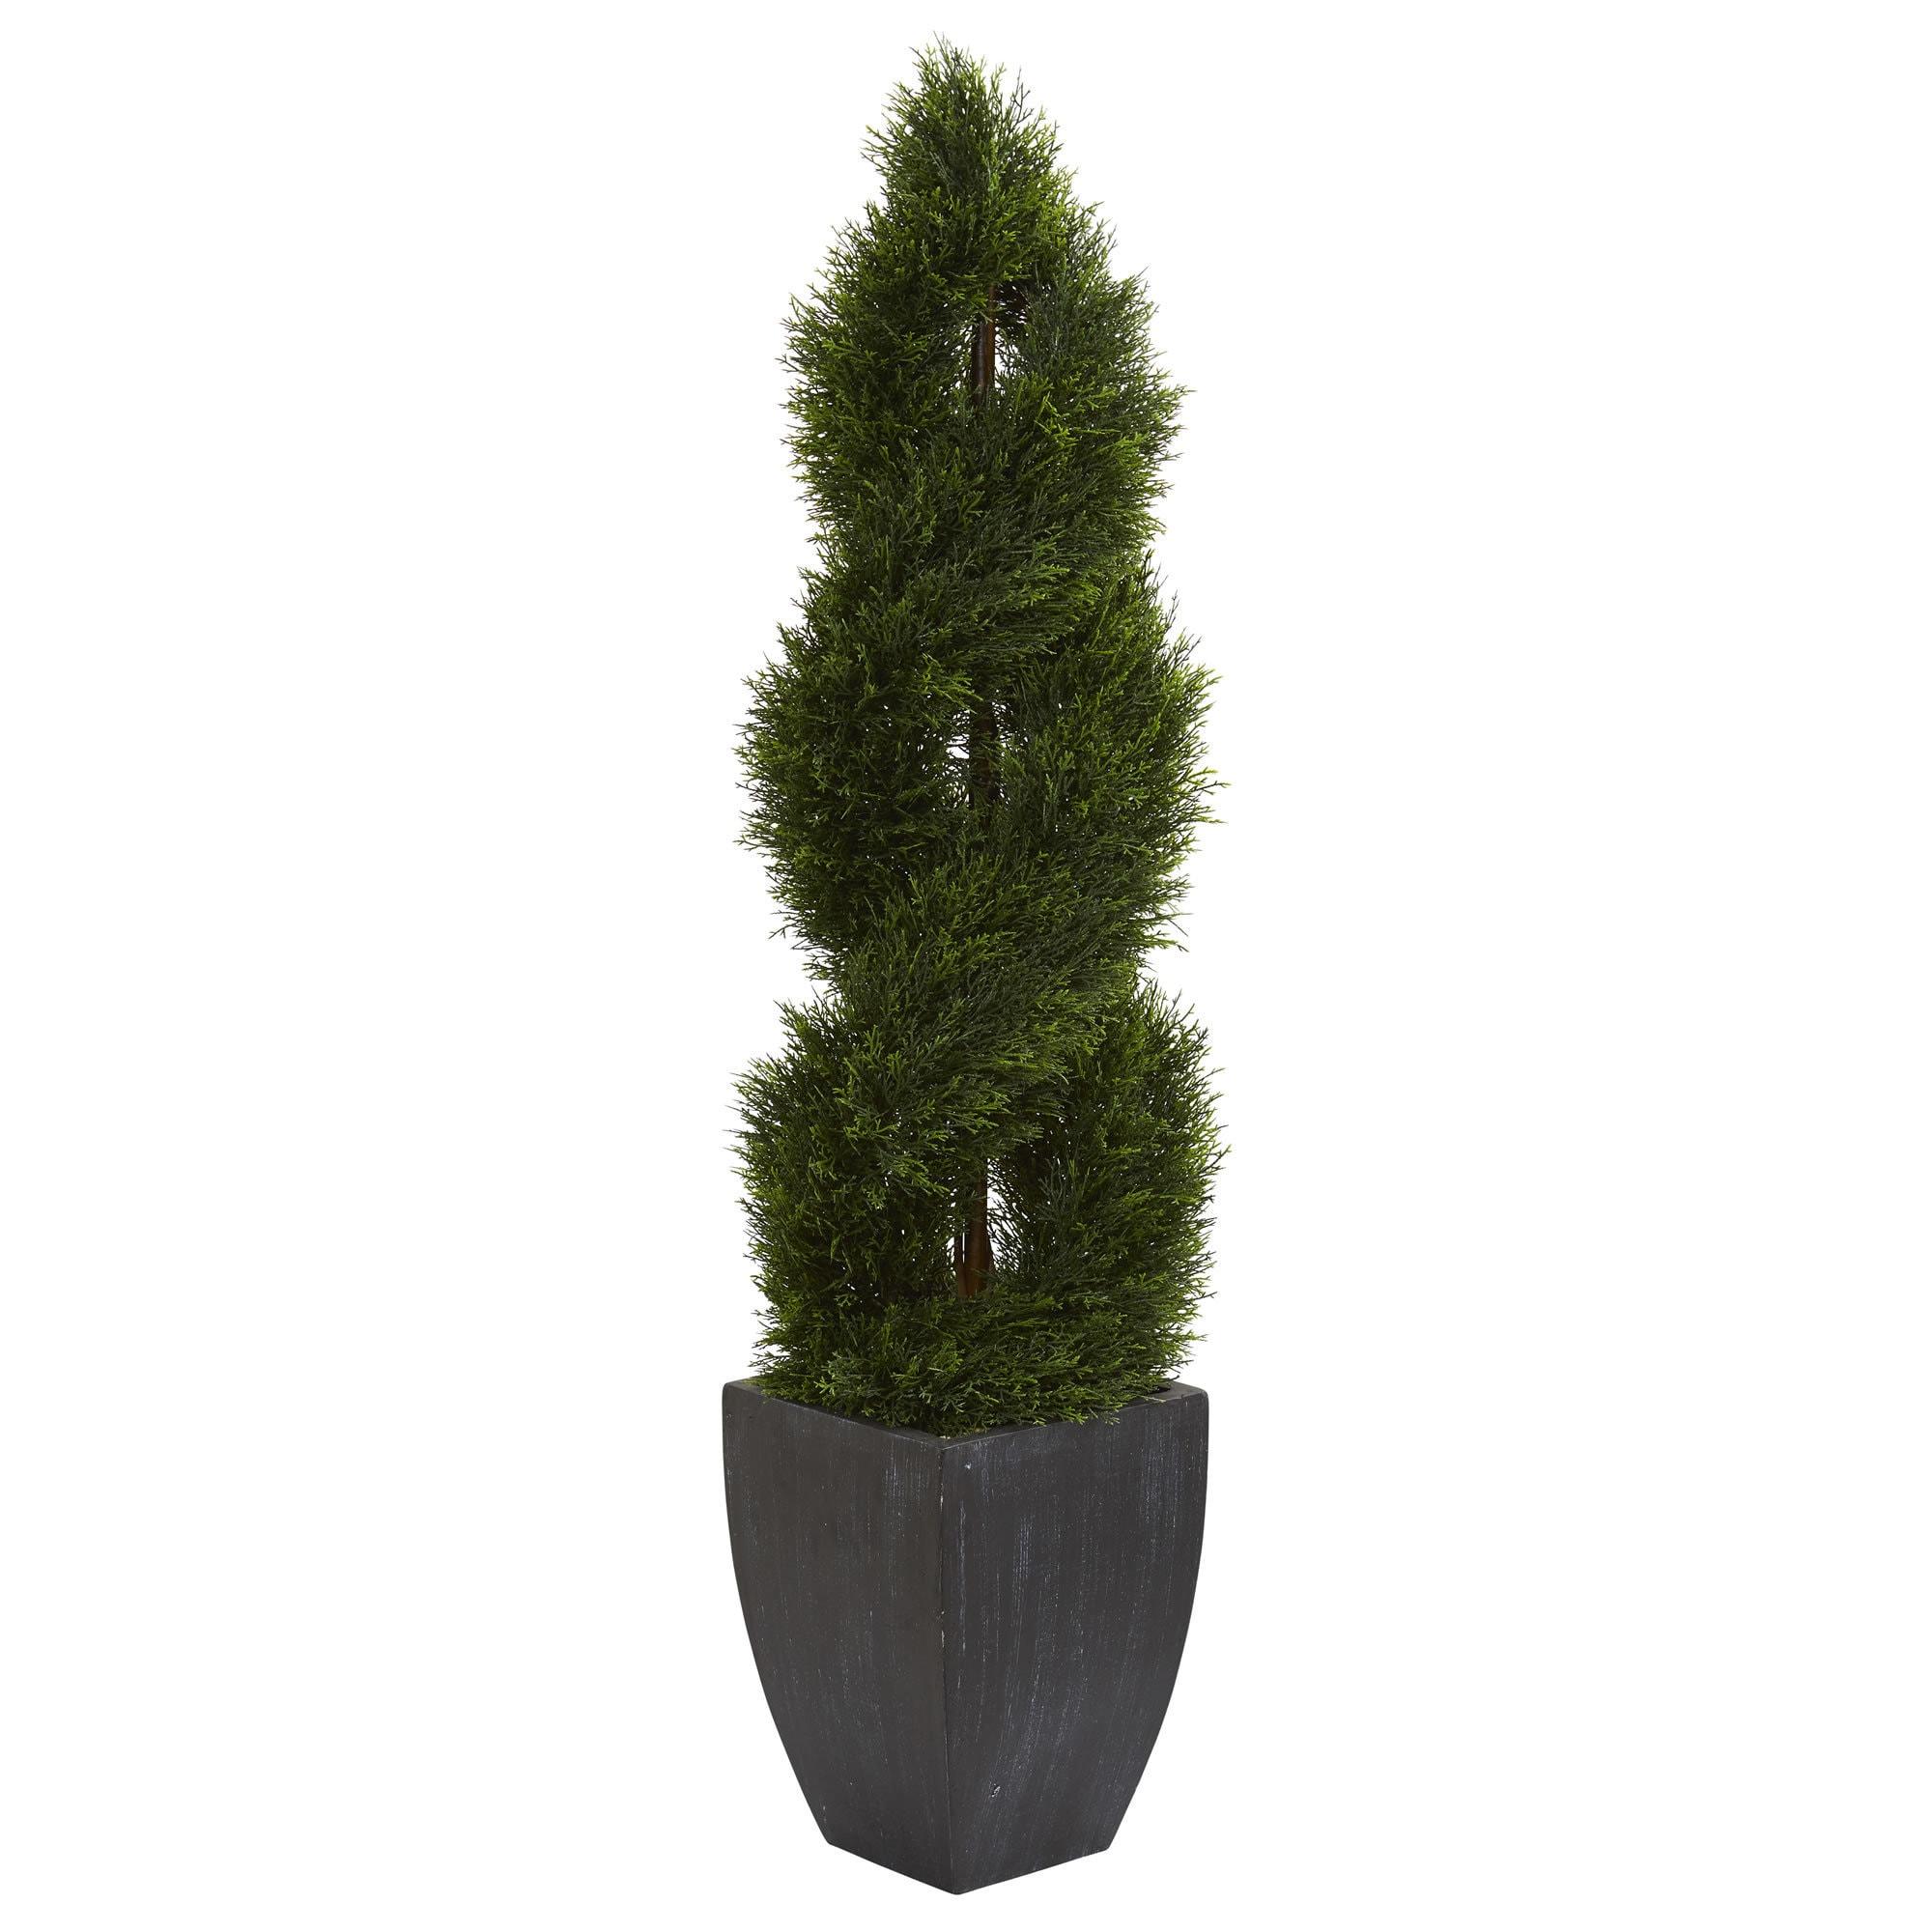 5 Double Pond Cypress Spiral Topiary Artificial Tree In Black Wash Planter Uv Resistant Indoor Outdoor Overstock 19532846